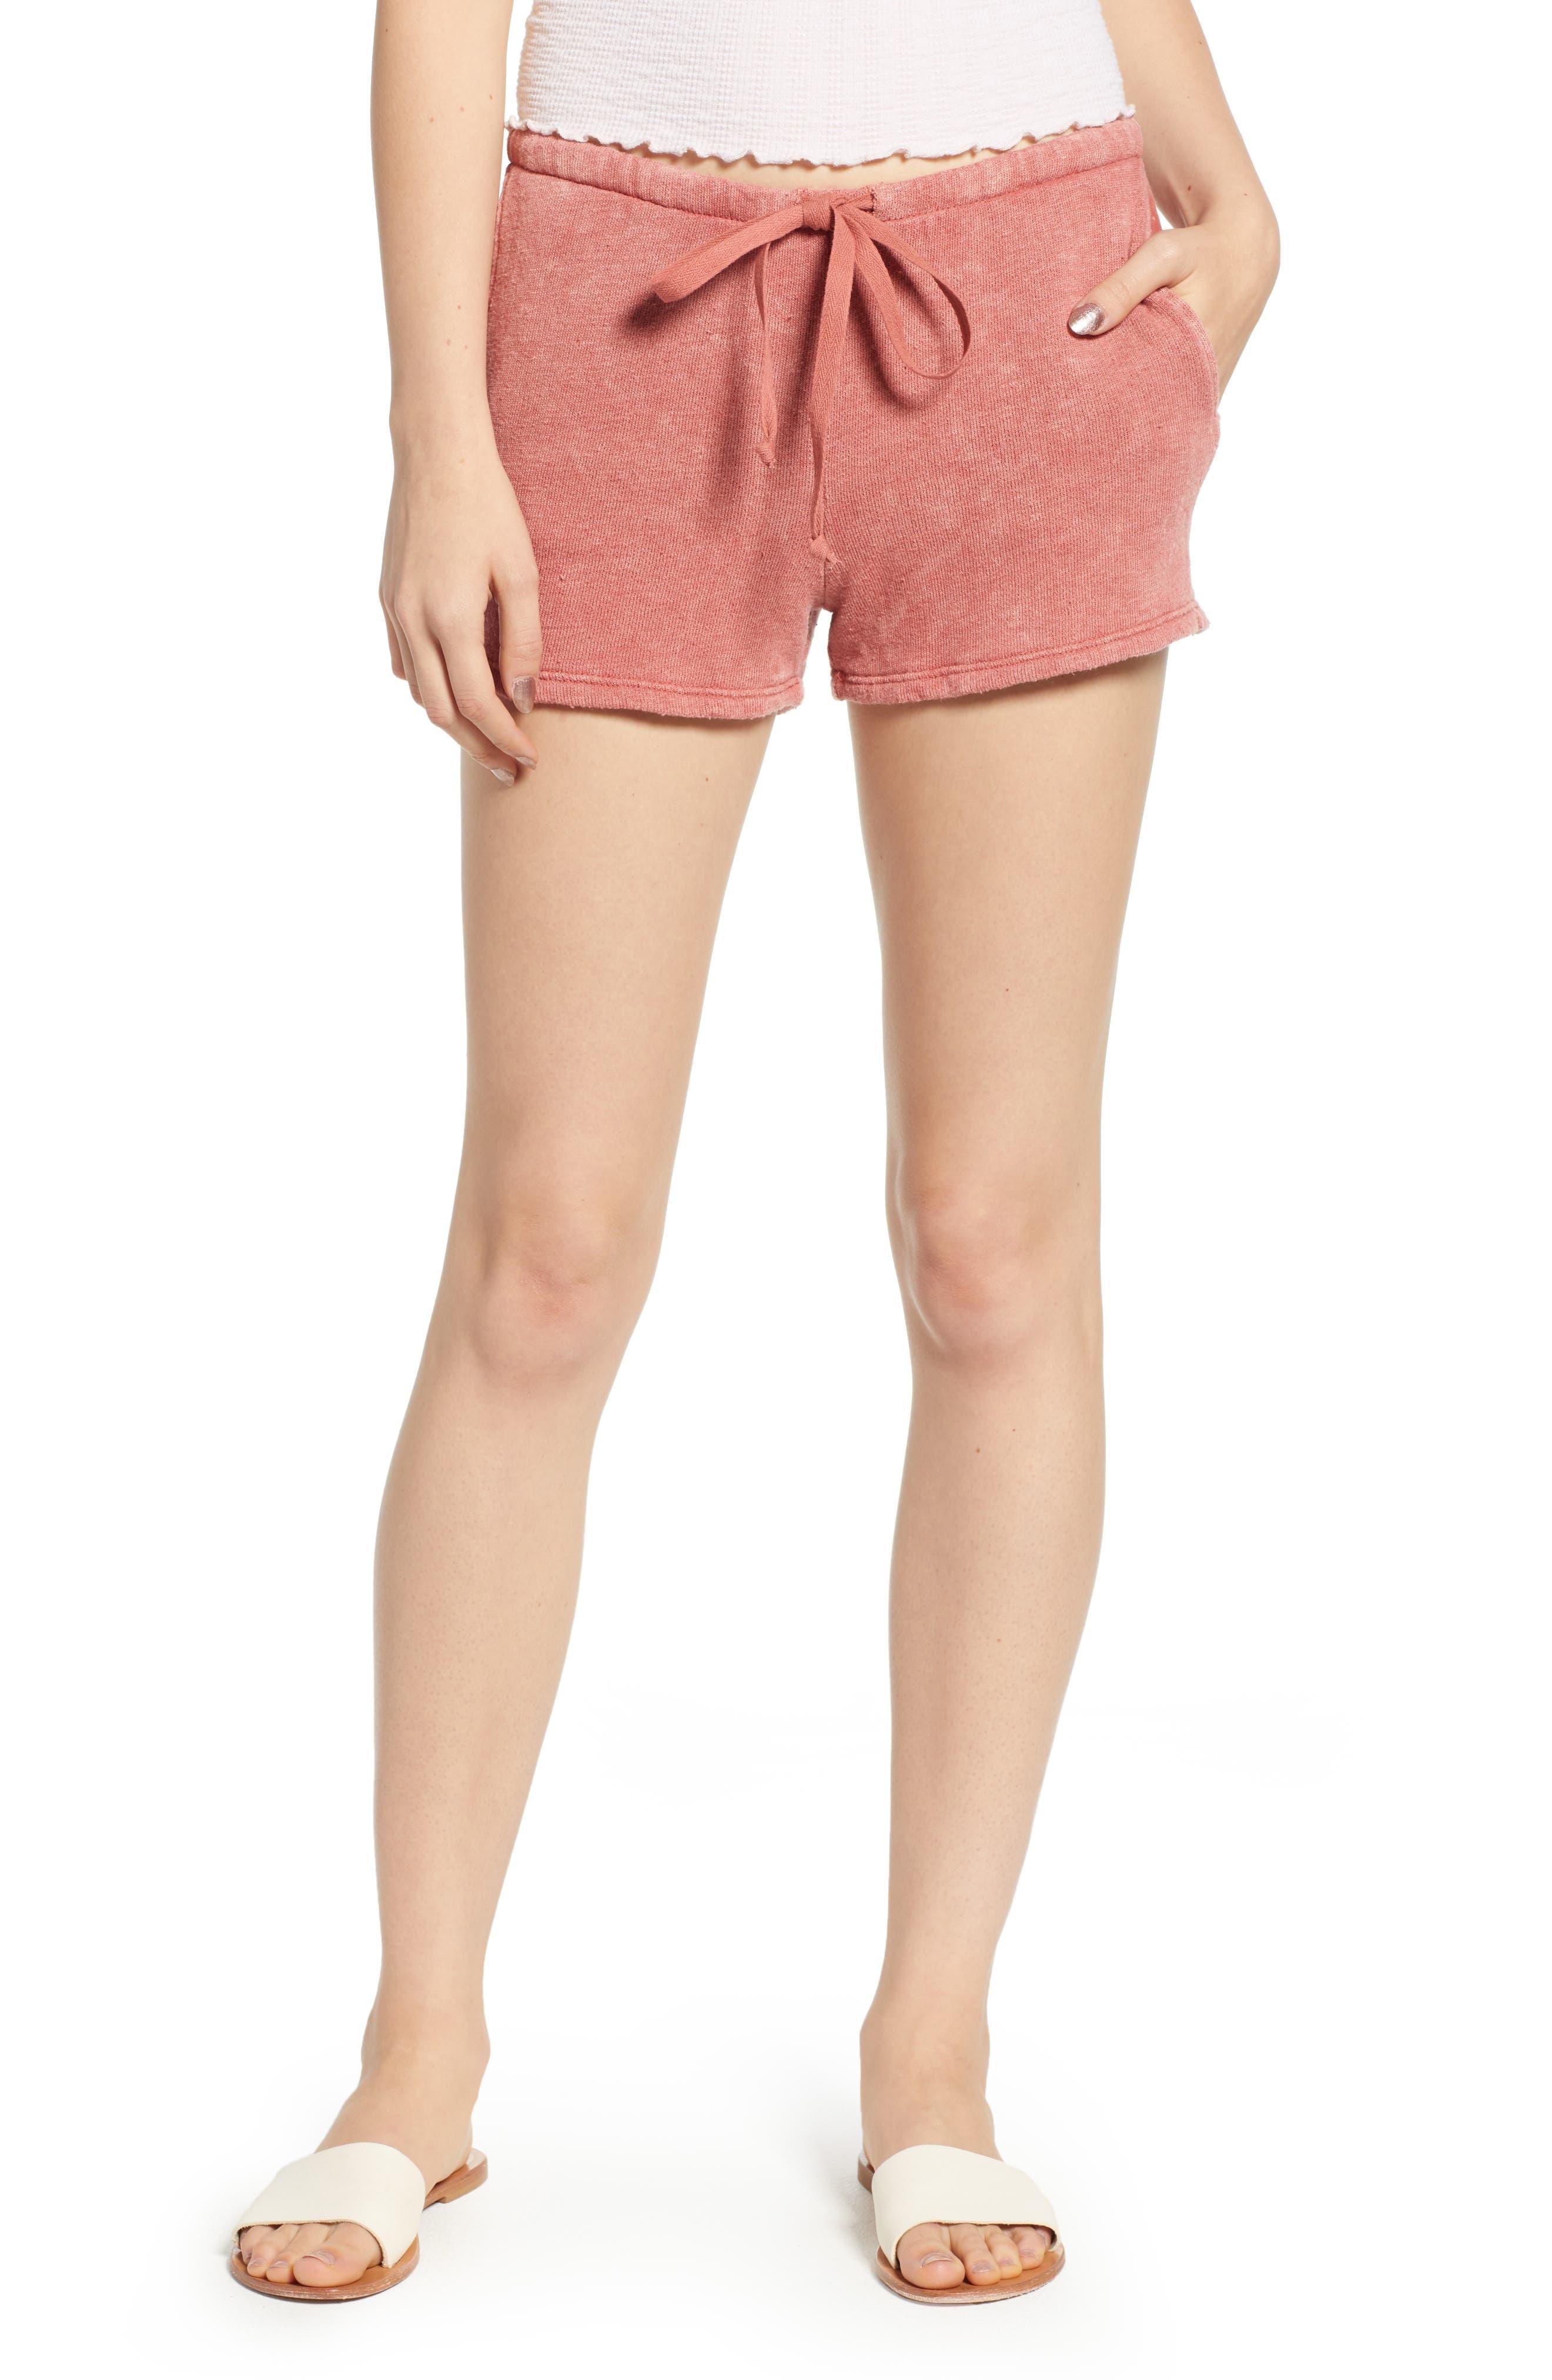 Kiama Shorts,                             Main thumbnail 1, color,                             Strawberry Rouge